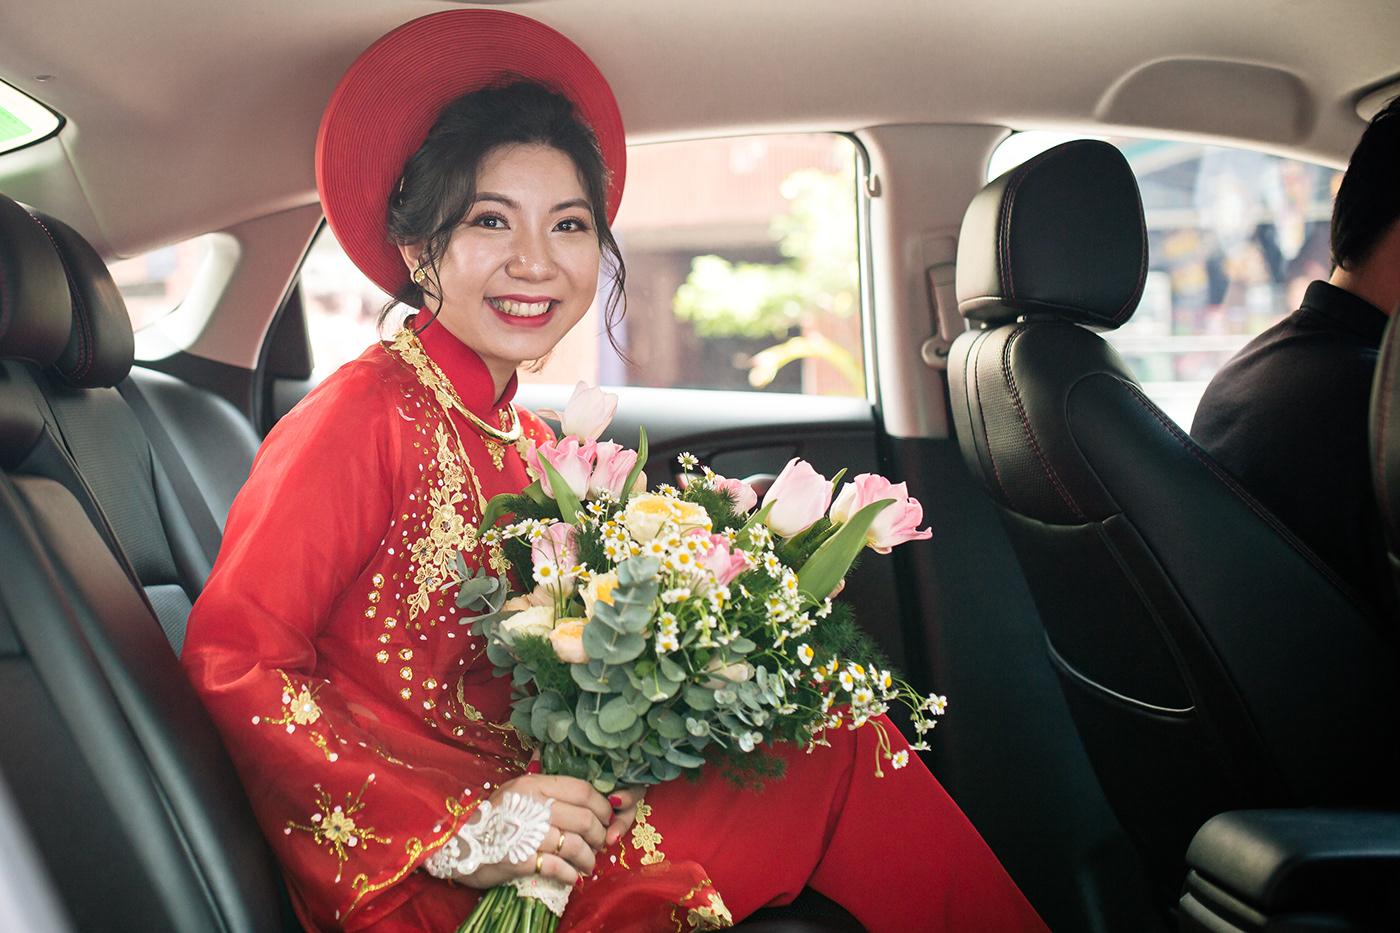 digital photography  Documentary  Photography  photojournalism  wedding